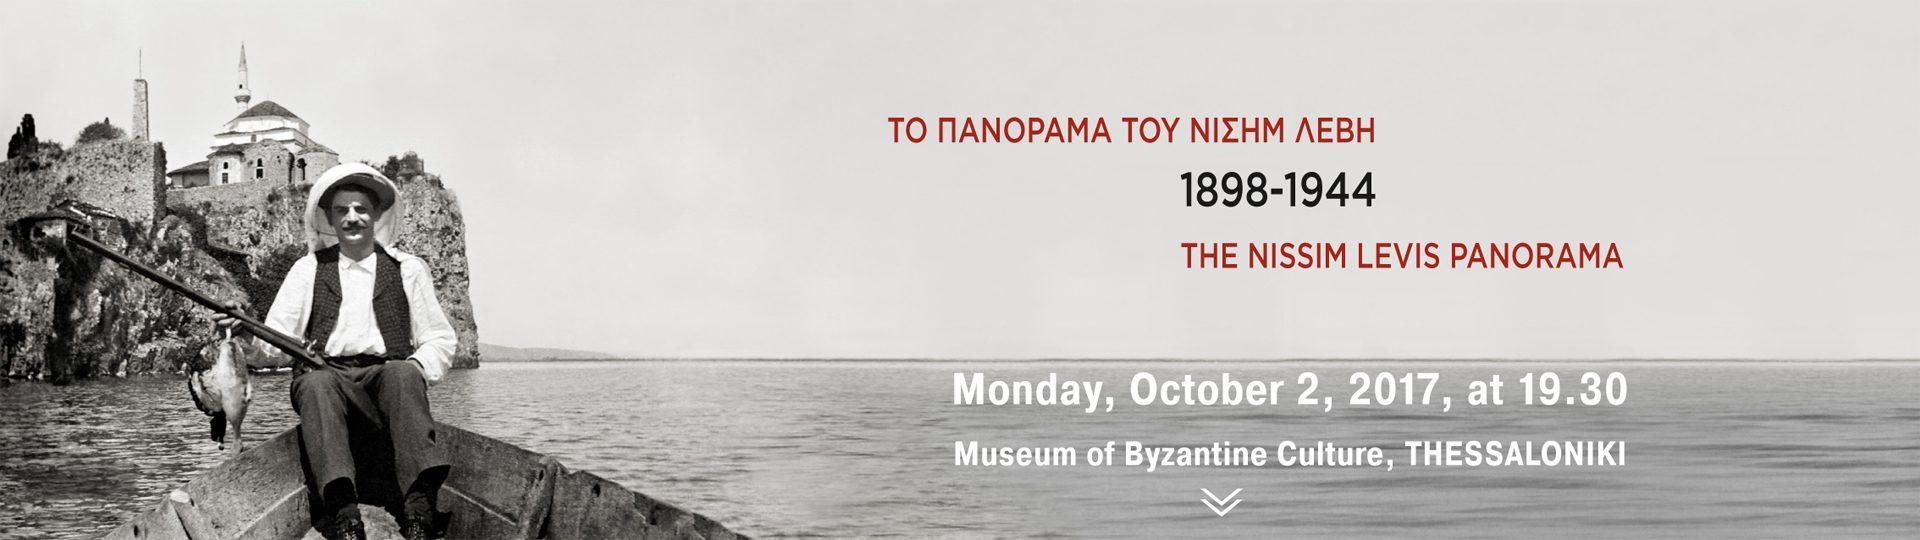 BOOK PRESENTATION: 1898–1944 THE NISSIM LEVIS PANORAMA